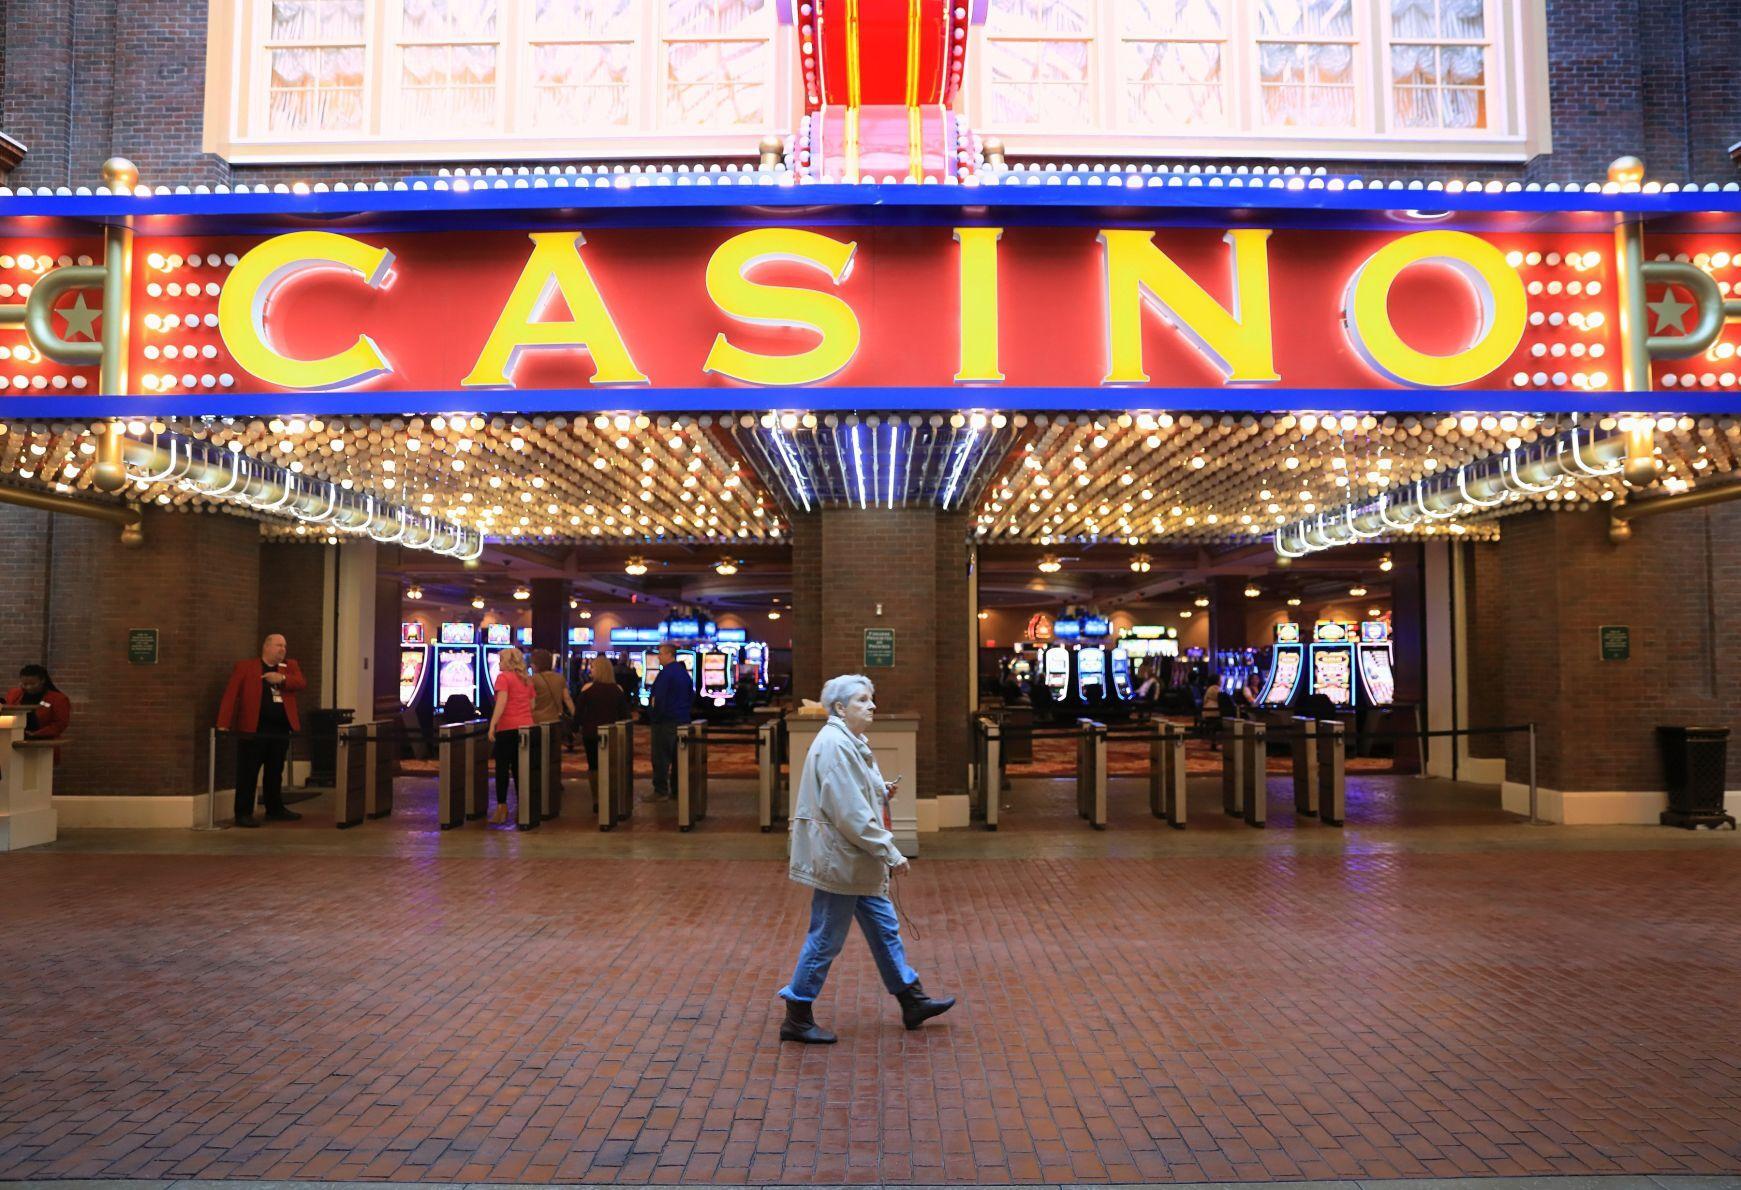 stltoday.com - Kurt Erickson - Veterans groups to lobby for higher casino fees to help state-run nursing homes